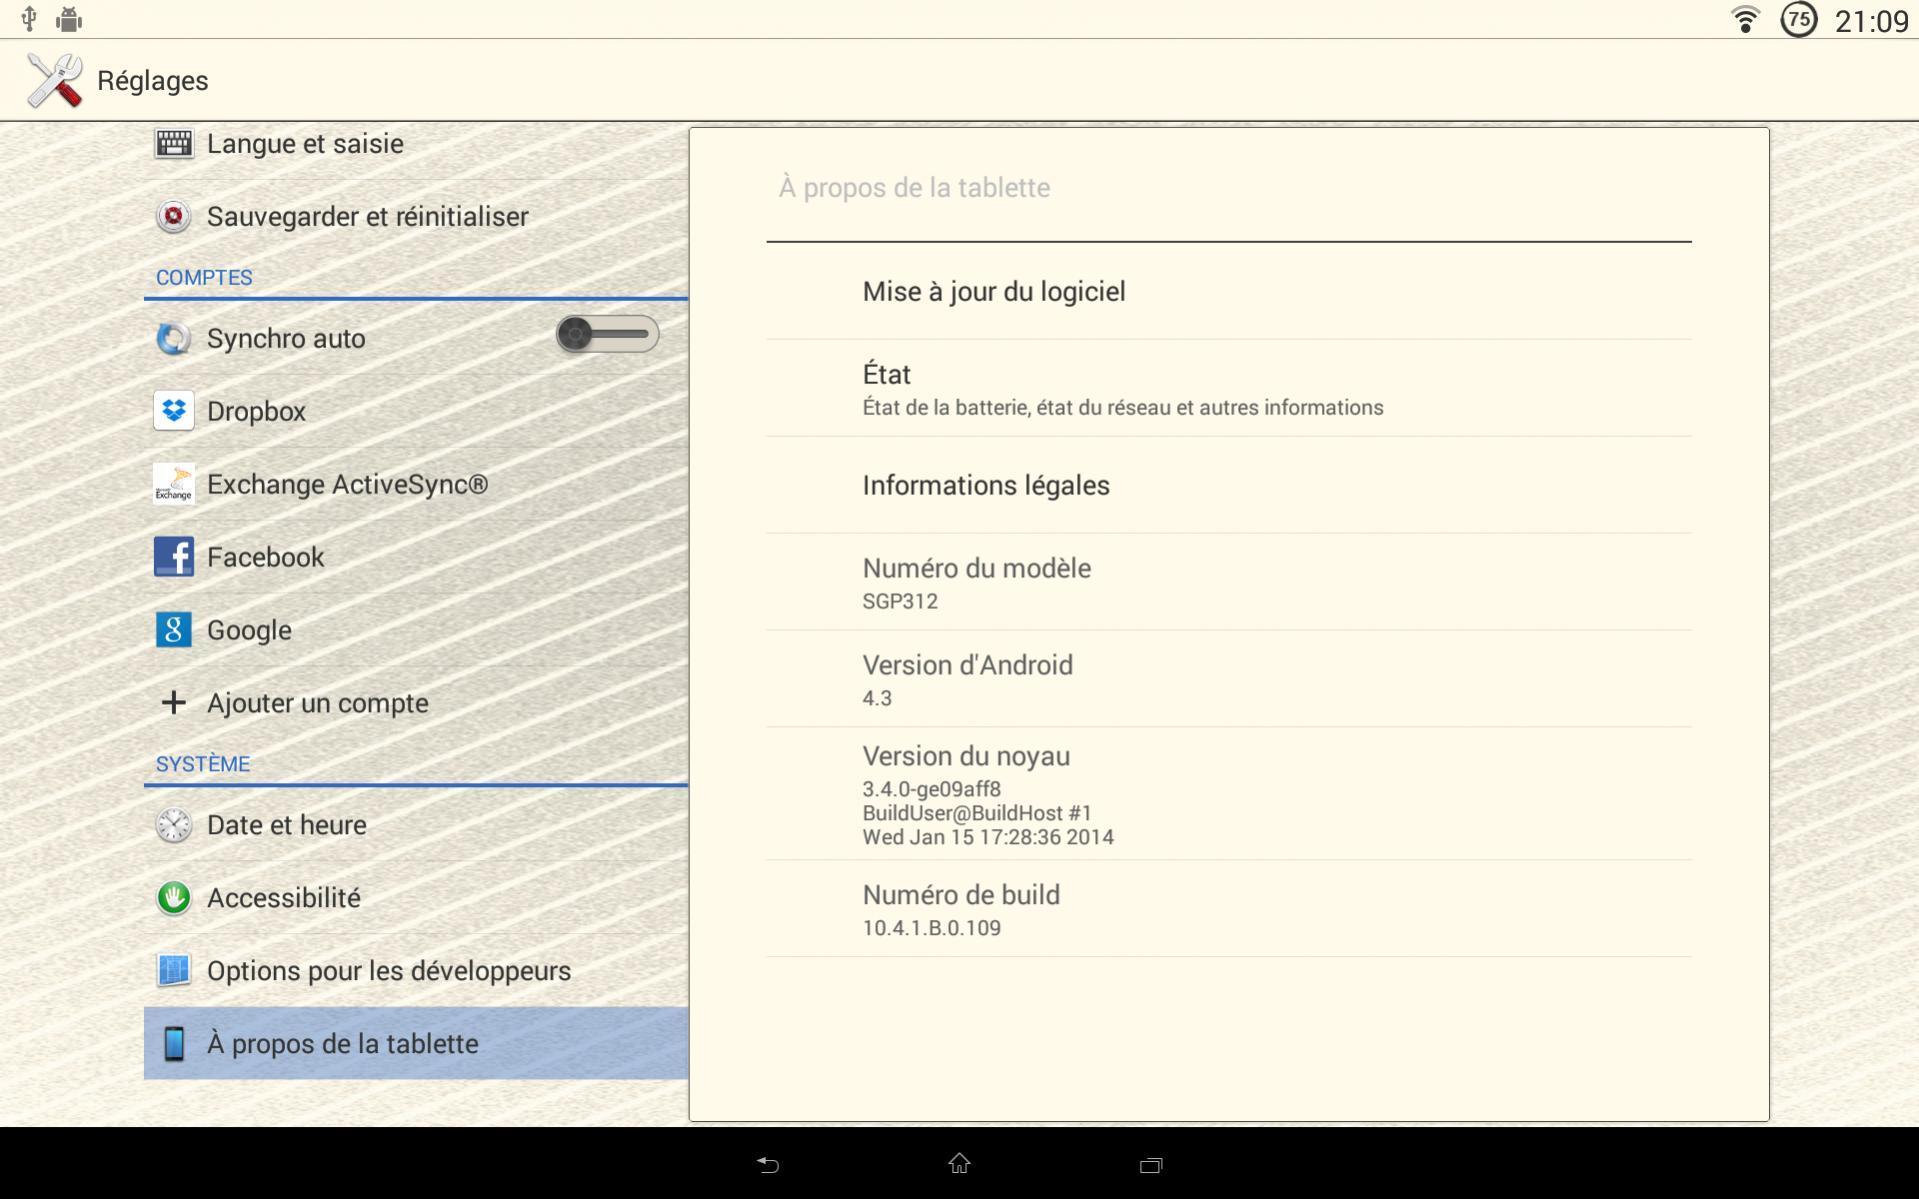 10.4.1.B.0.109 firmware Xperia Tablet Z